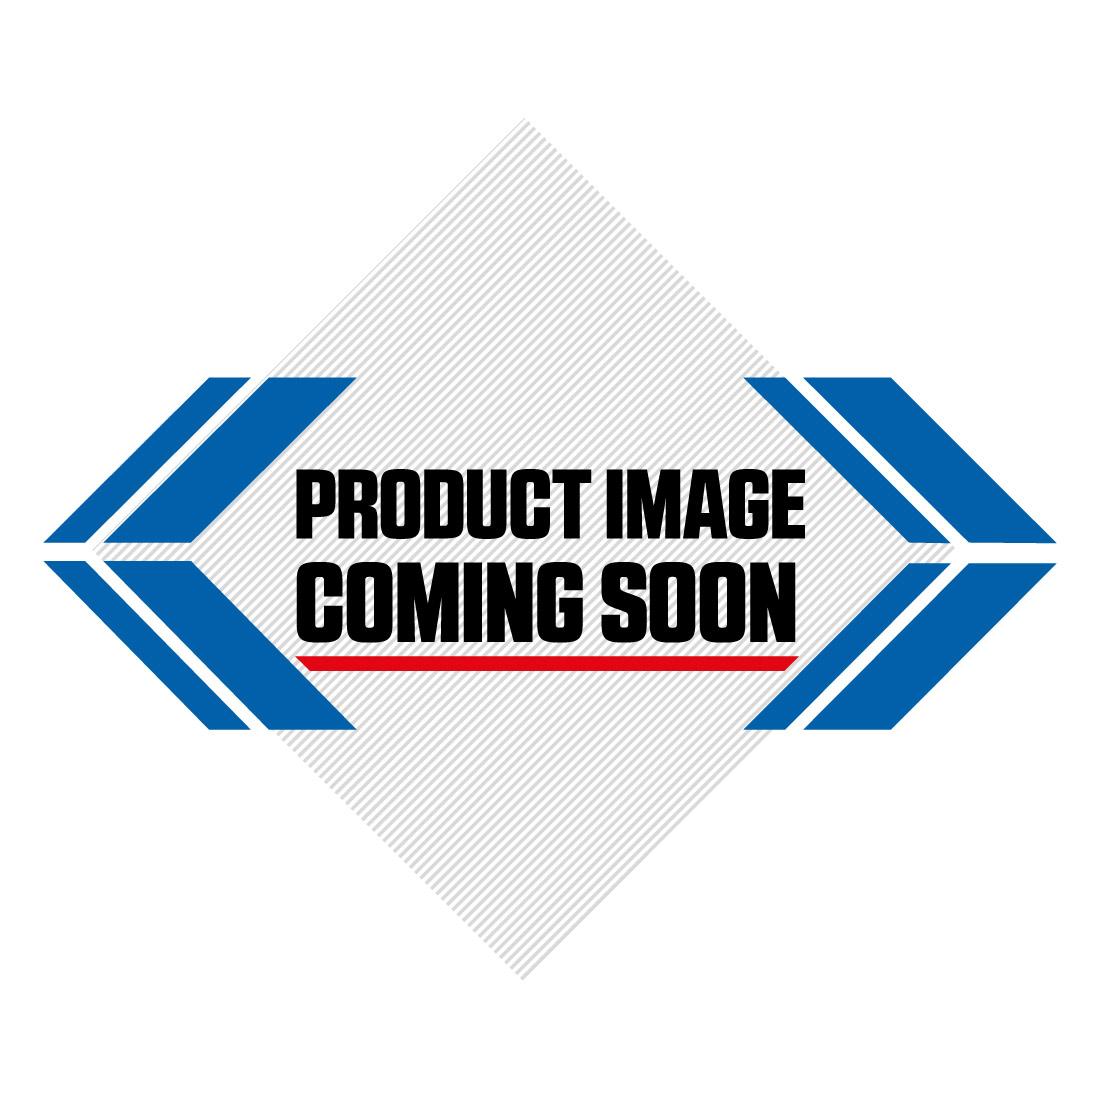 Suzuki Plastic Kit RMZ 450 (11-12) OEM Factory Image-4